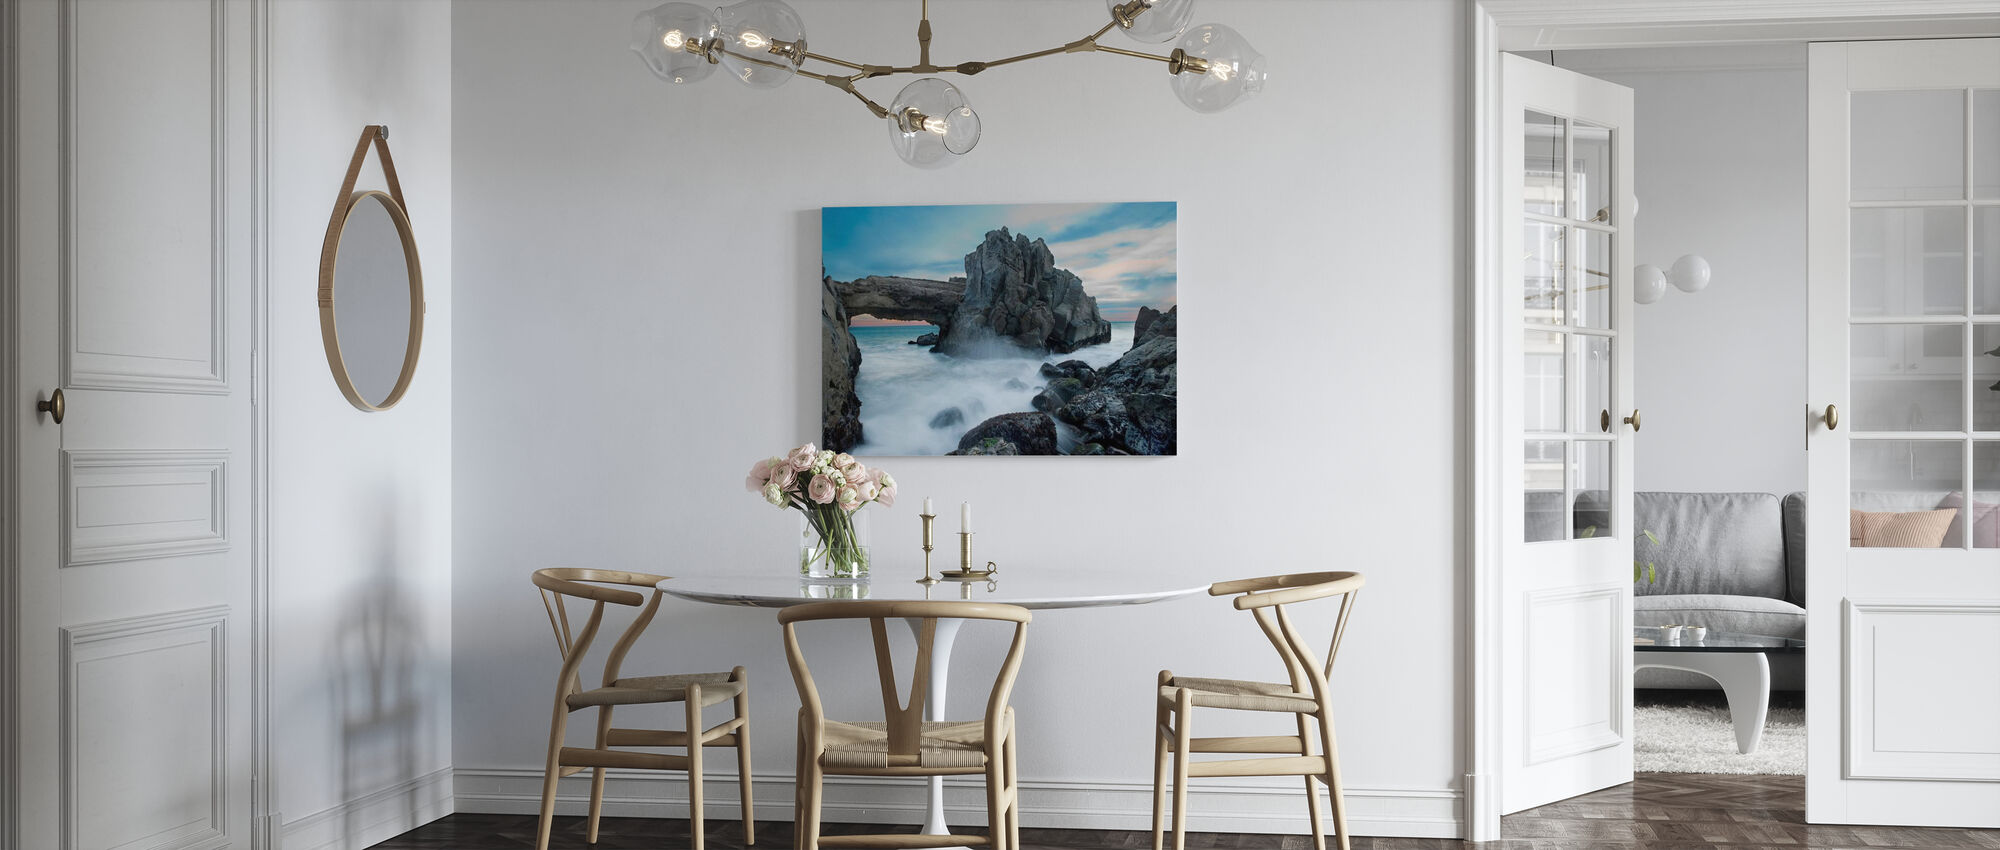 Dramatische boog - Canvas print - Keuken